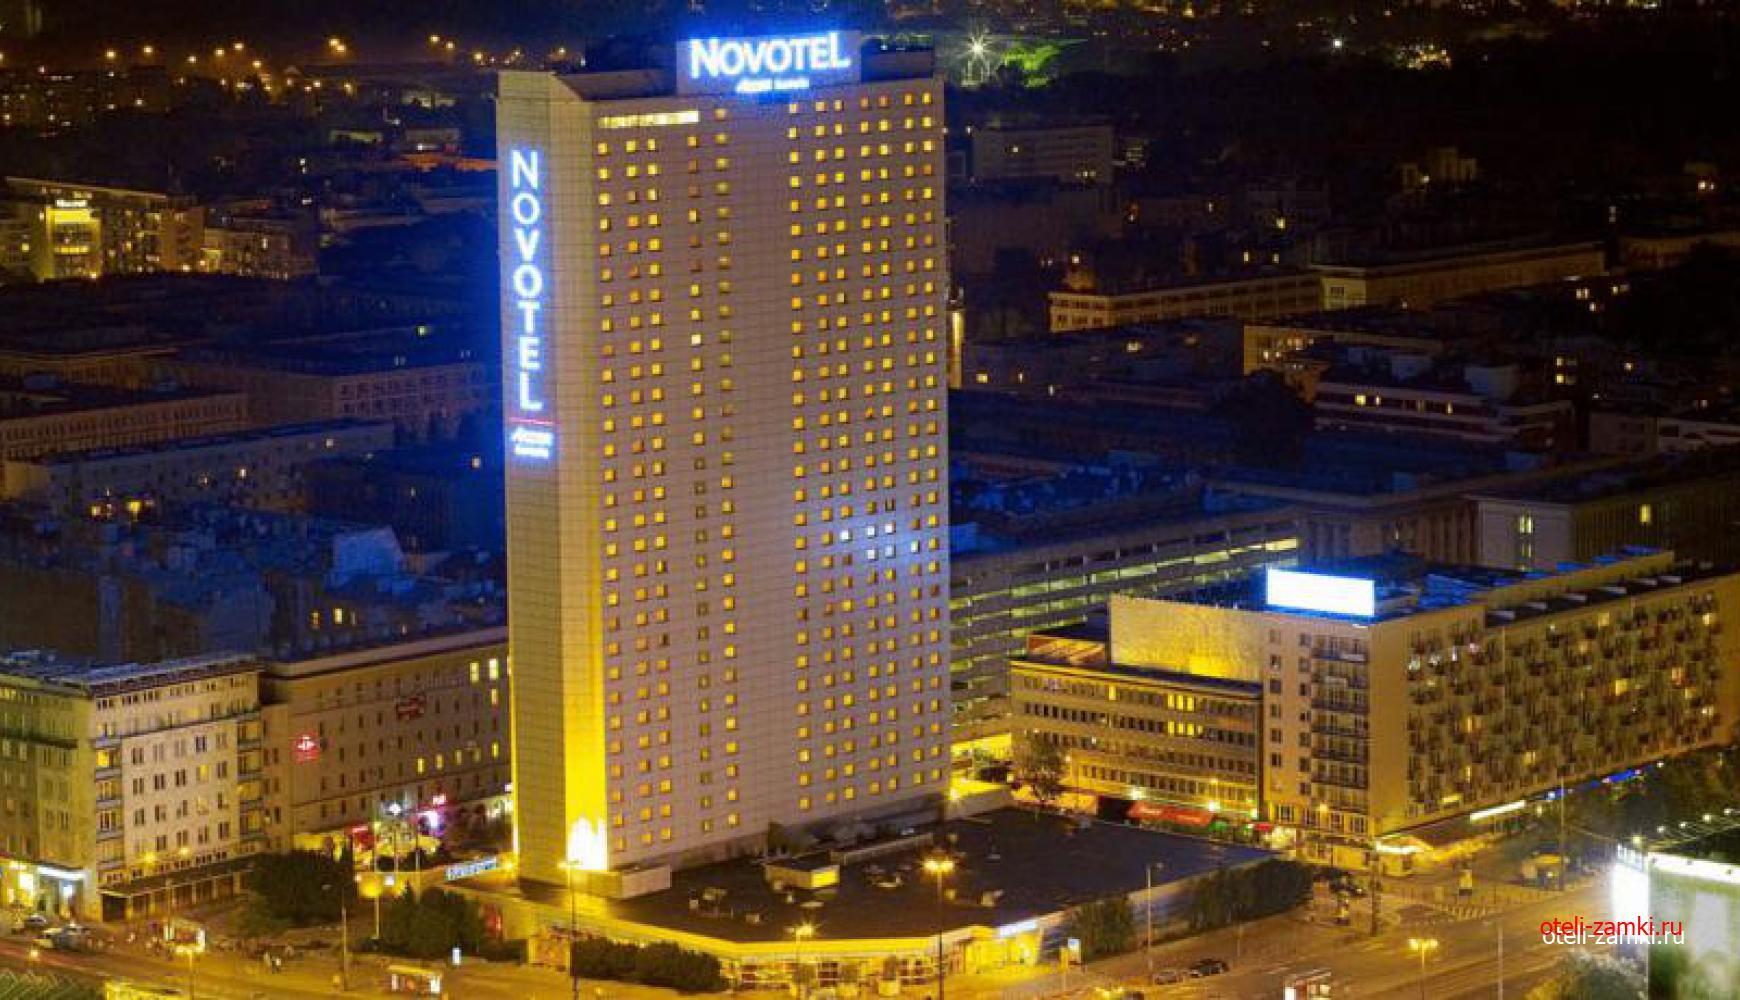 Novotel Warszawa Centrum 4* (Варшава, Польша)